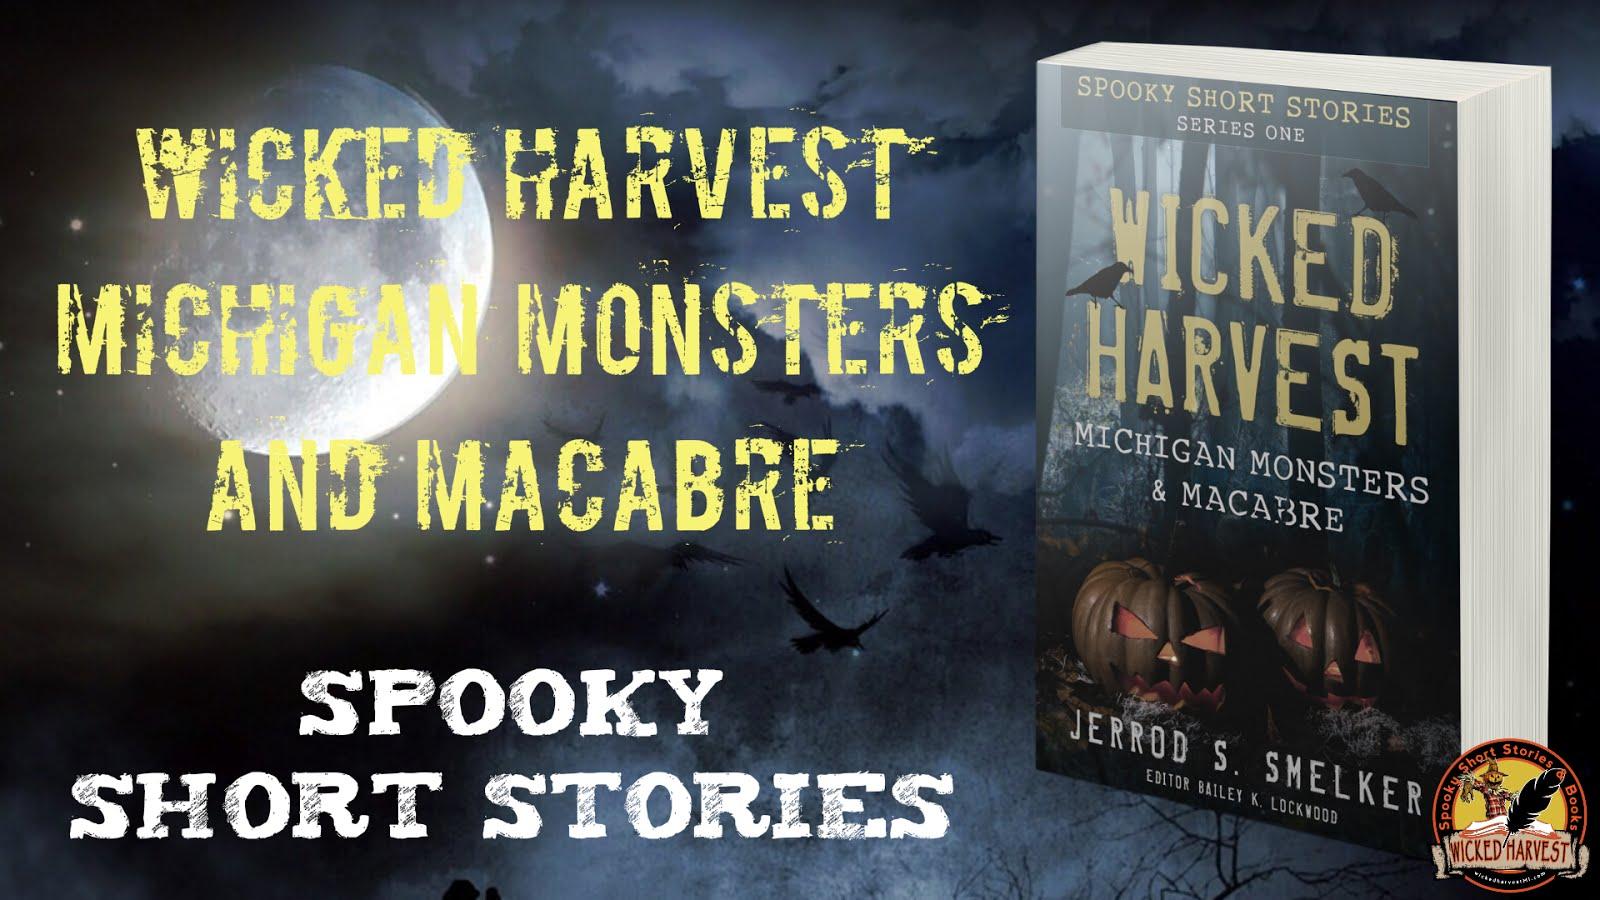 Spooky Short Stories for Halloween